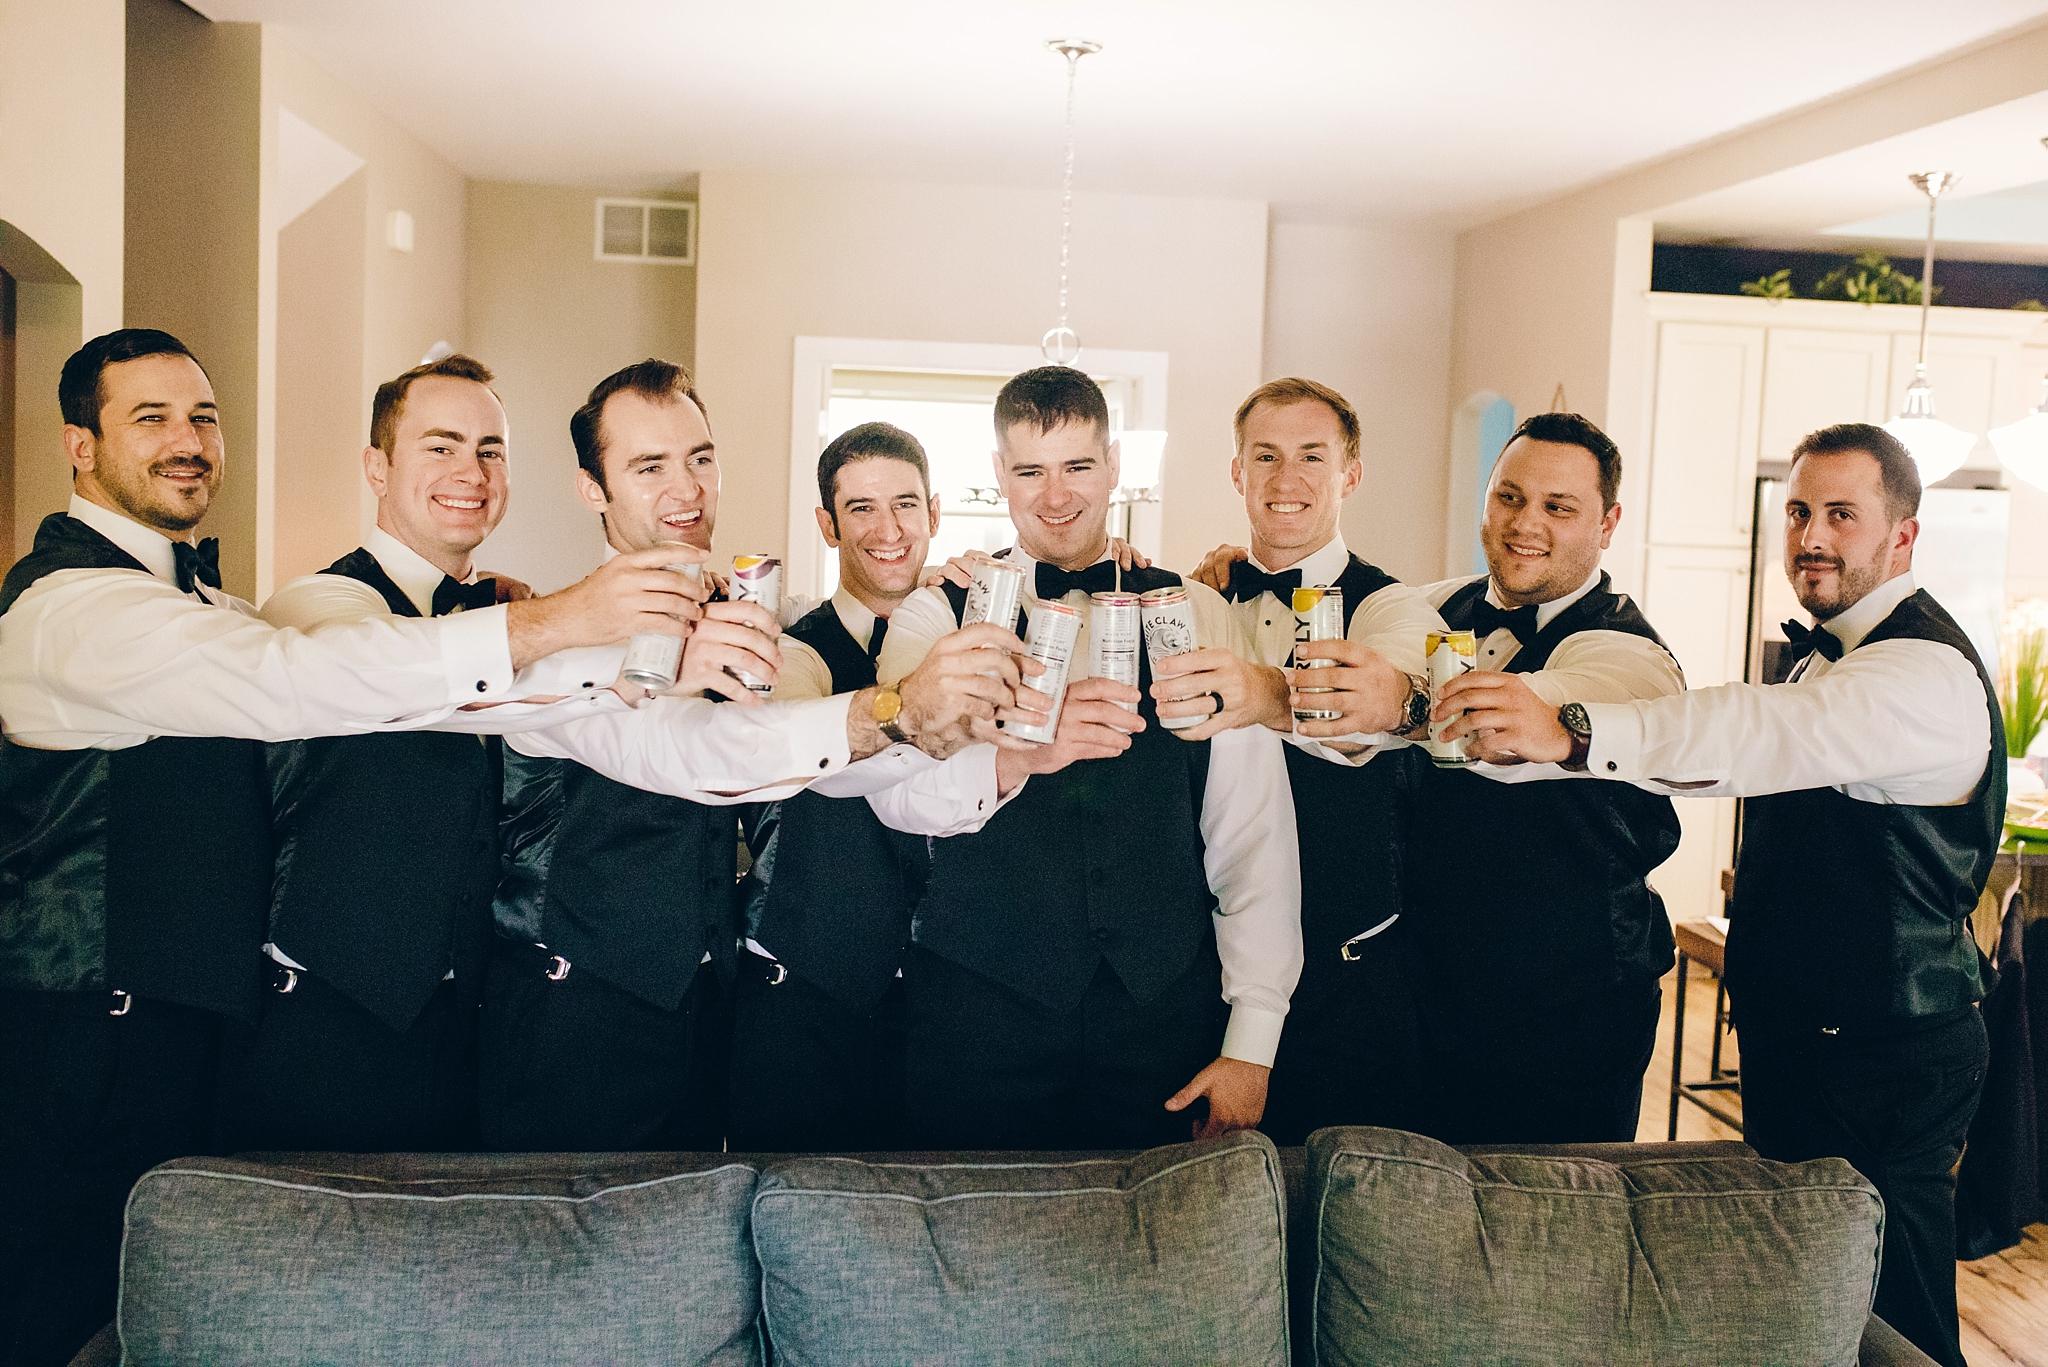 baker-lofts-holland-michigan-wedding-photographer_0320.jpg